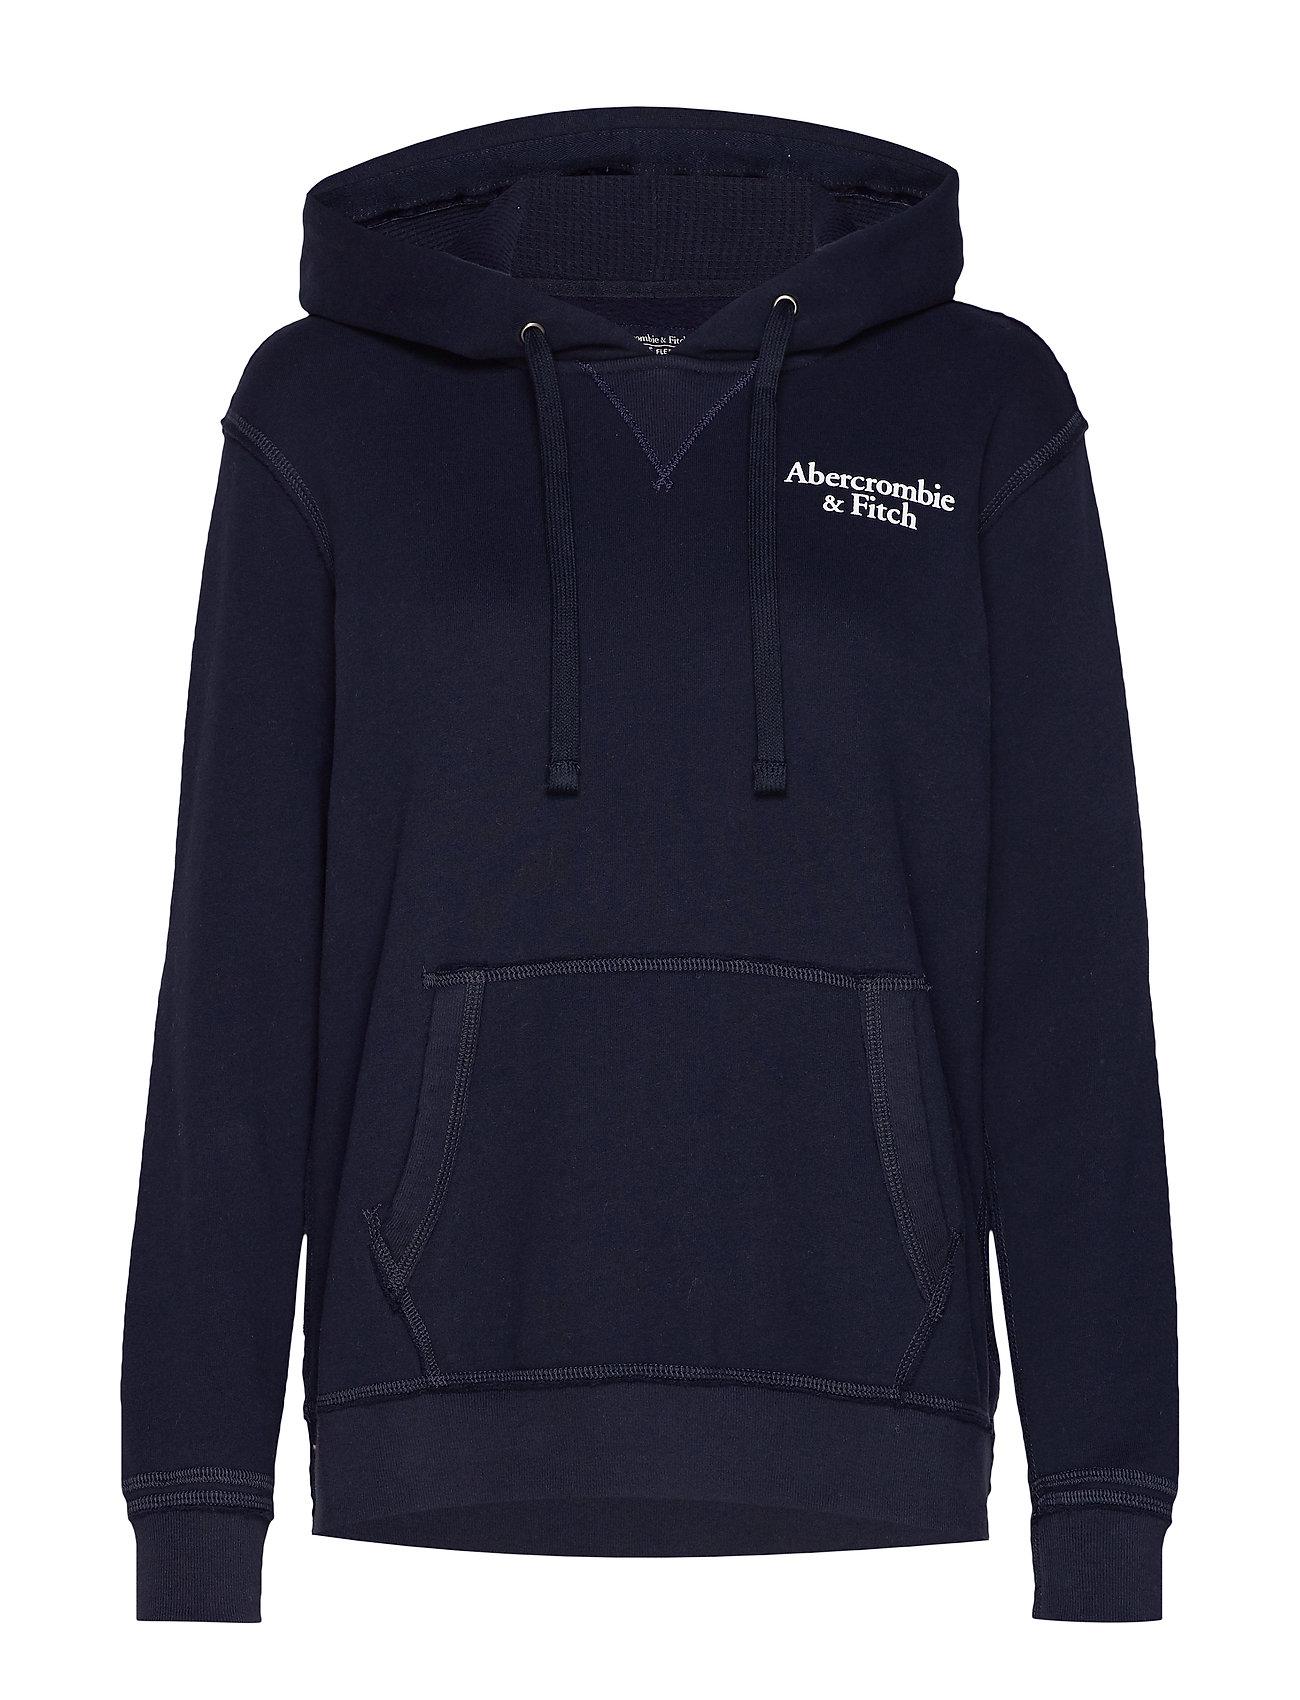 Abercrombie & Fitch Trend Logo Popover - NAVY DD